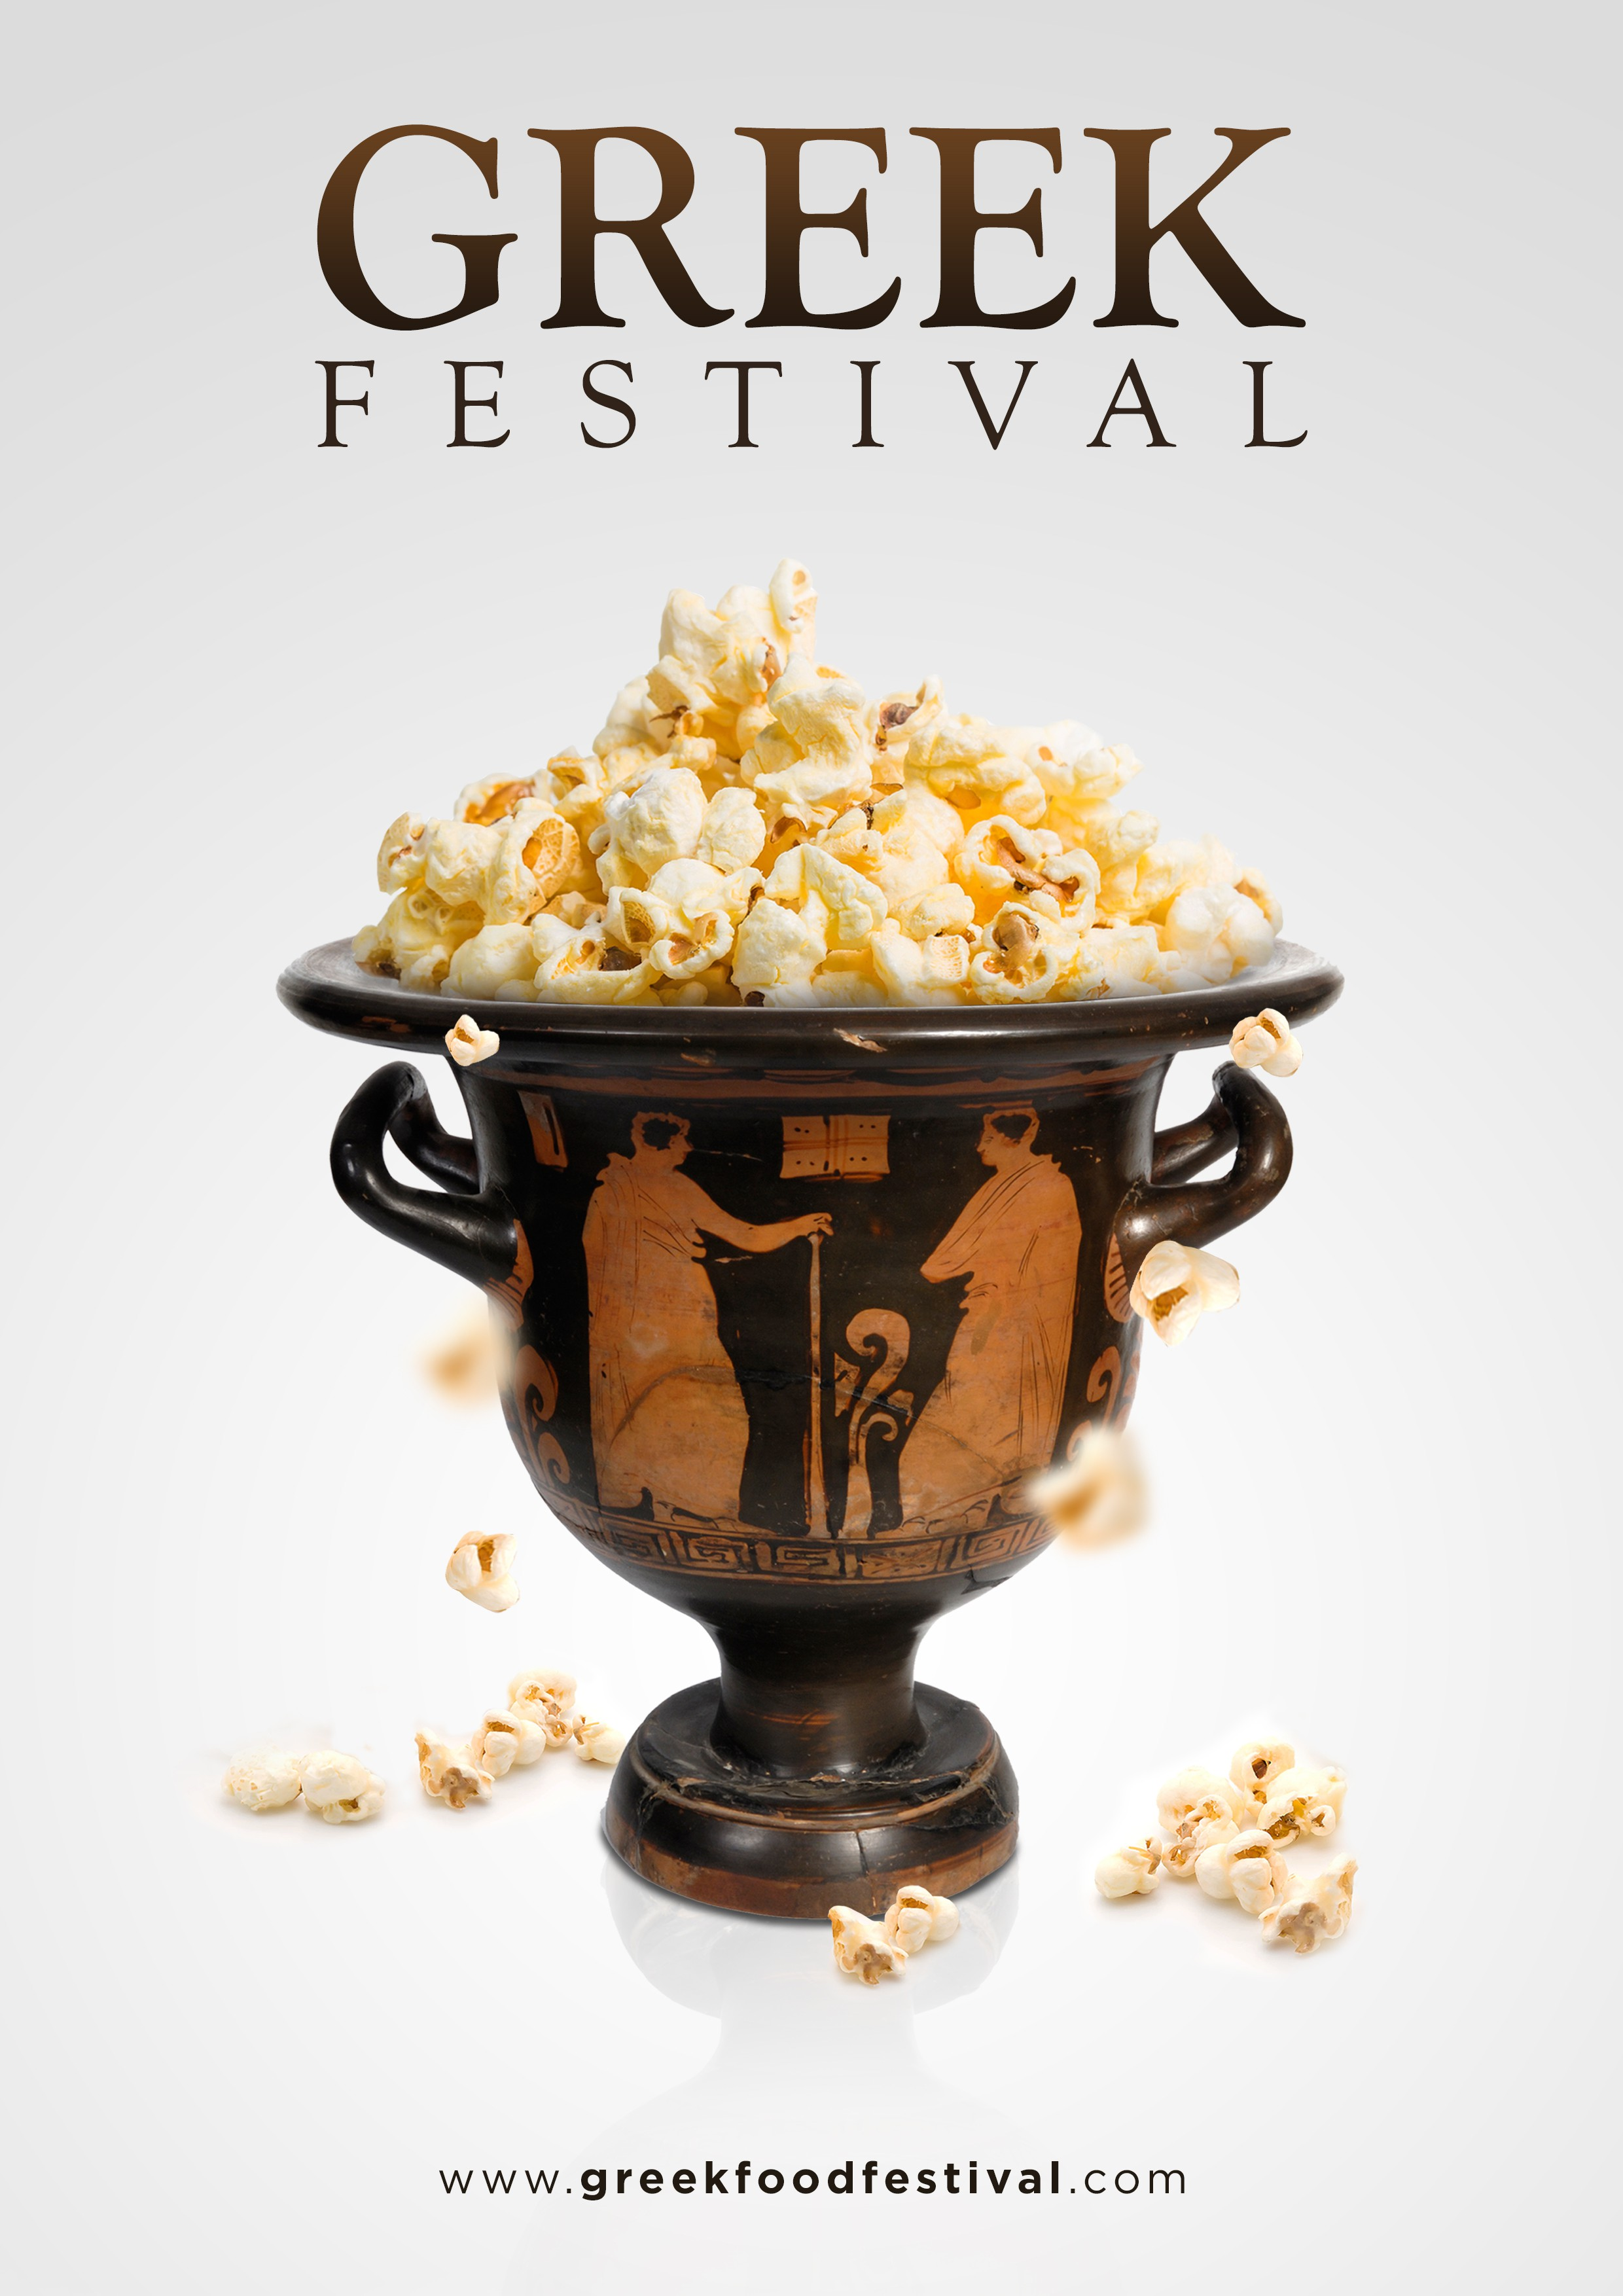 Popcorn Ad for Greek Festival